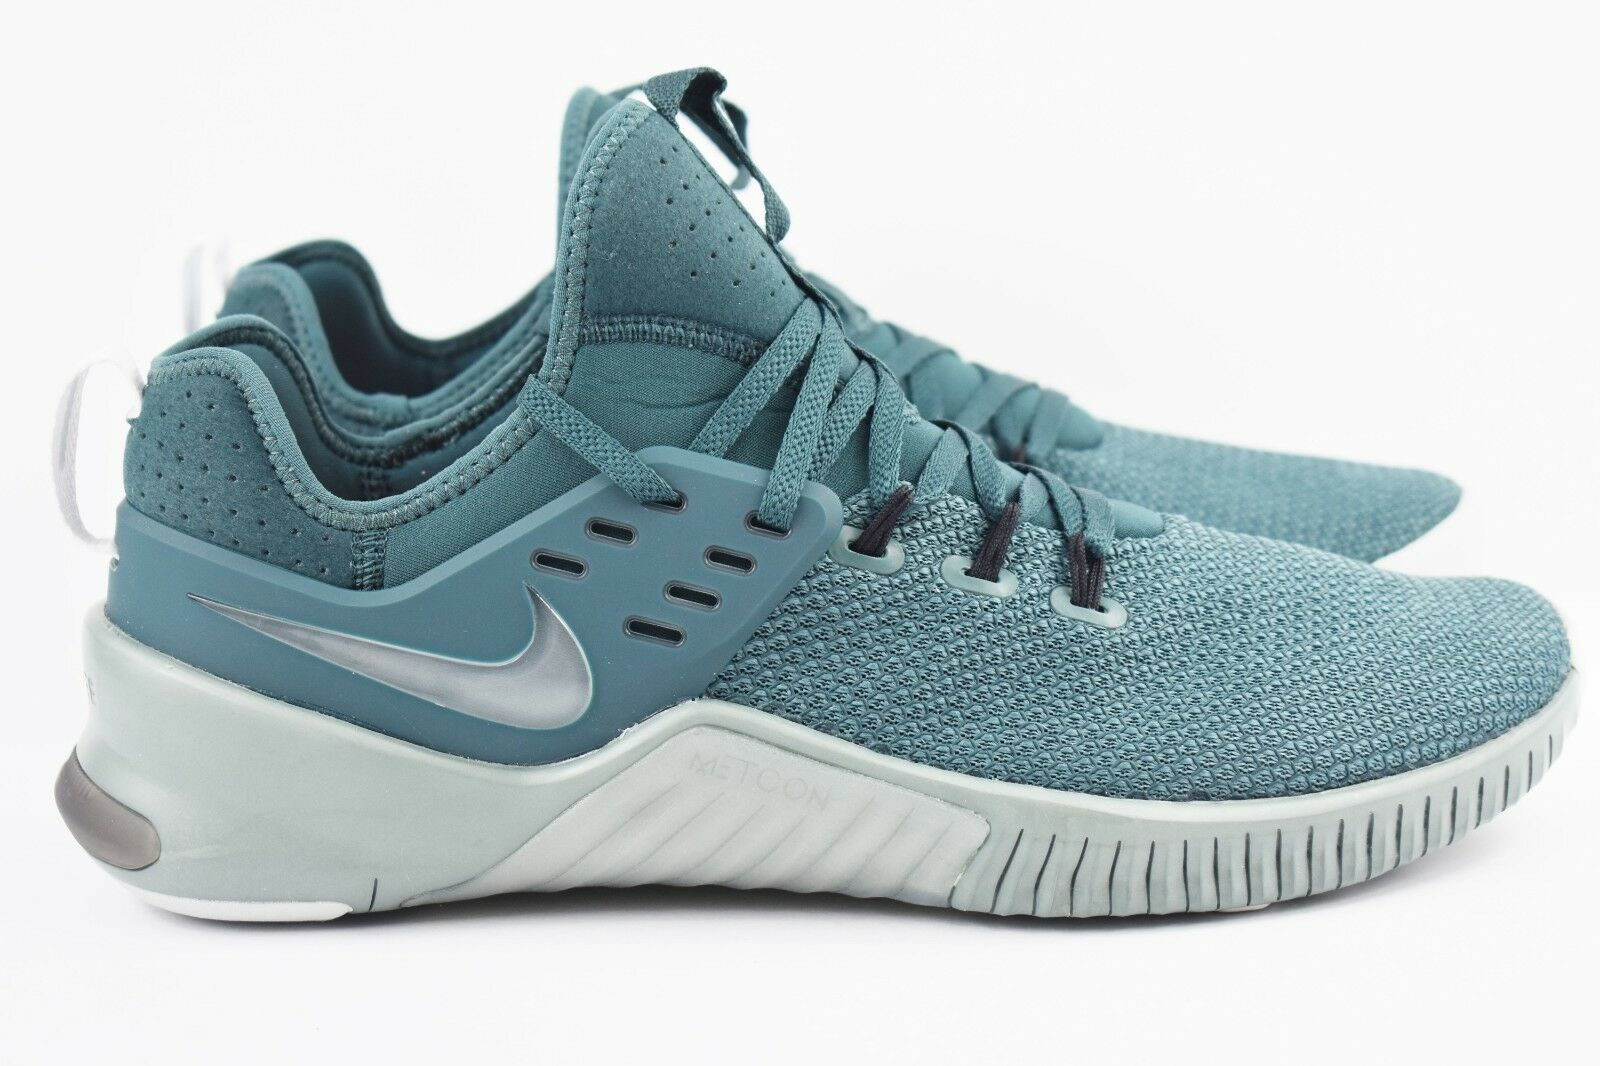 Nike Free X Metcon Mens Size 9.5 Green Training shoes Crossfit AH8141 331 Rare